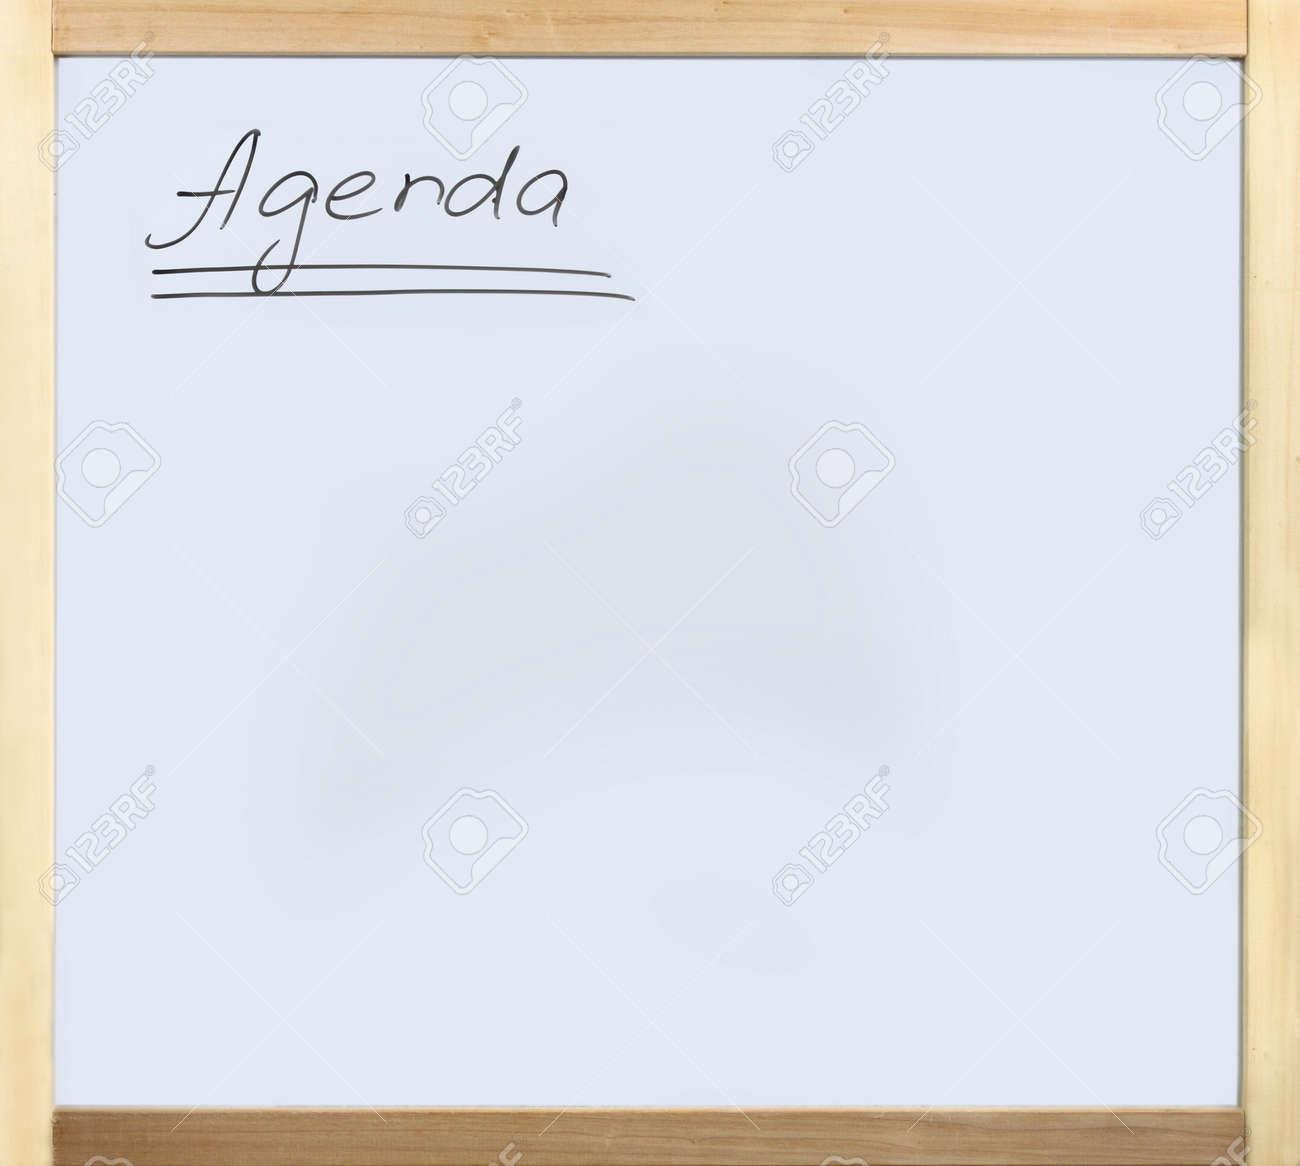 Word Agenda Written On Whiteboard In Wooden Frame Stock Photo ...